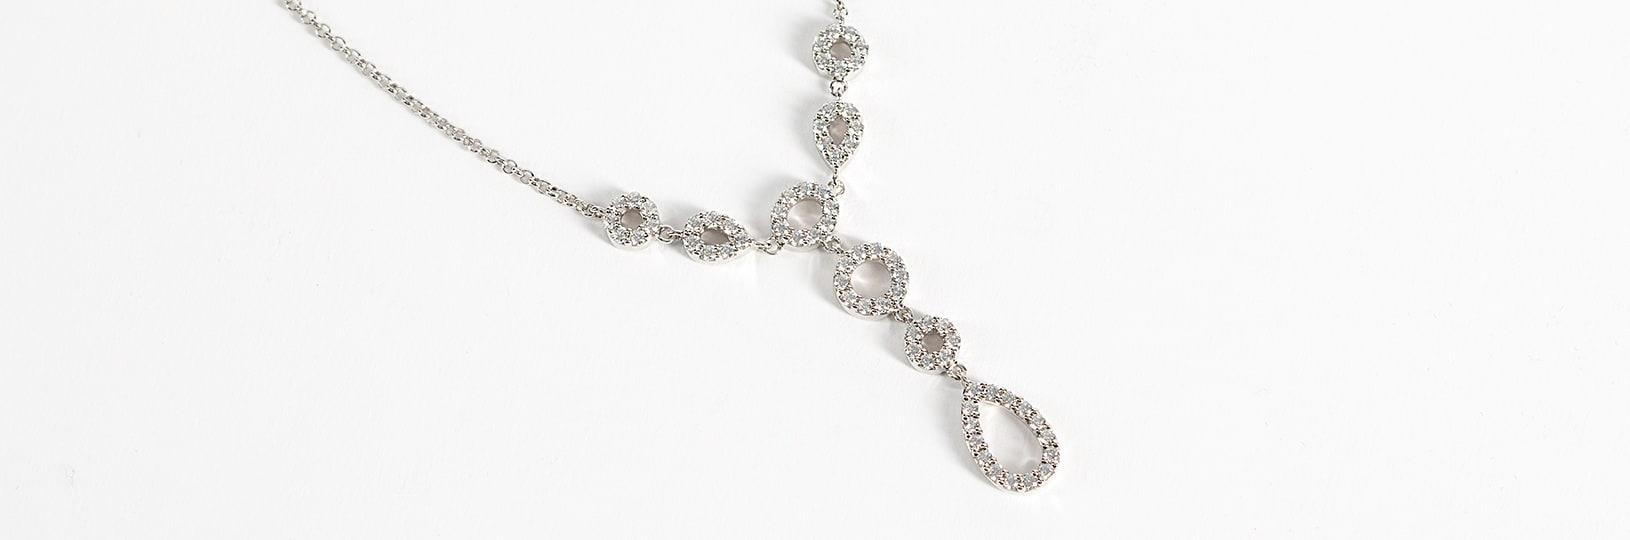 Simulated diamond necklace.